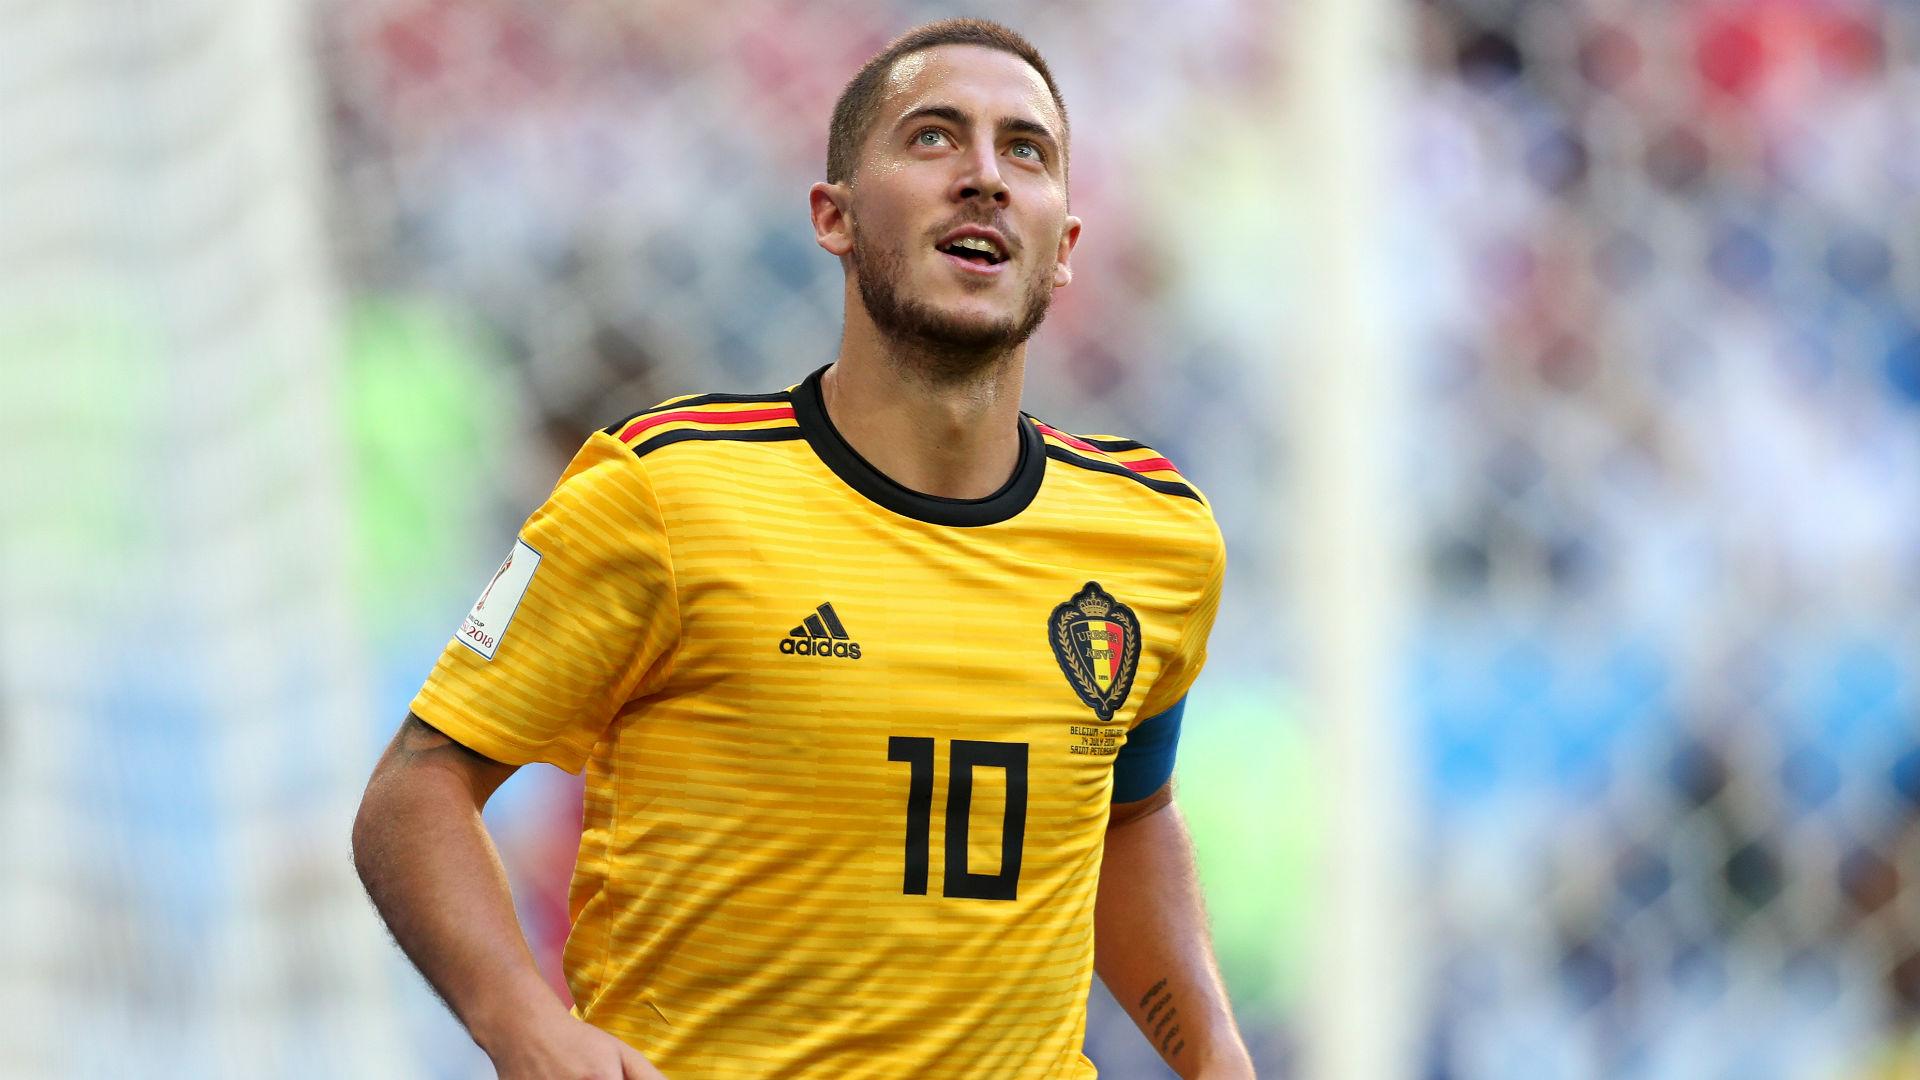 WATCH: Hazard celebrates Madrid move with finishing clinic in training